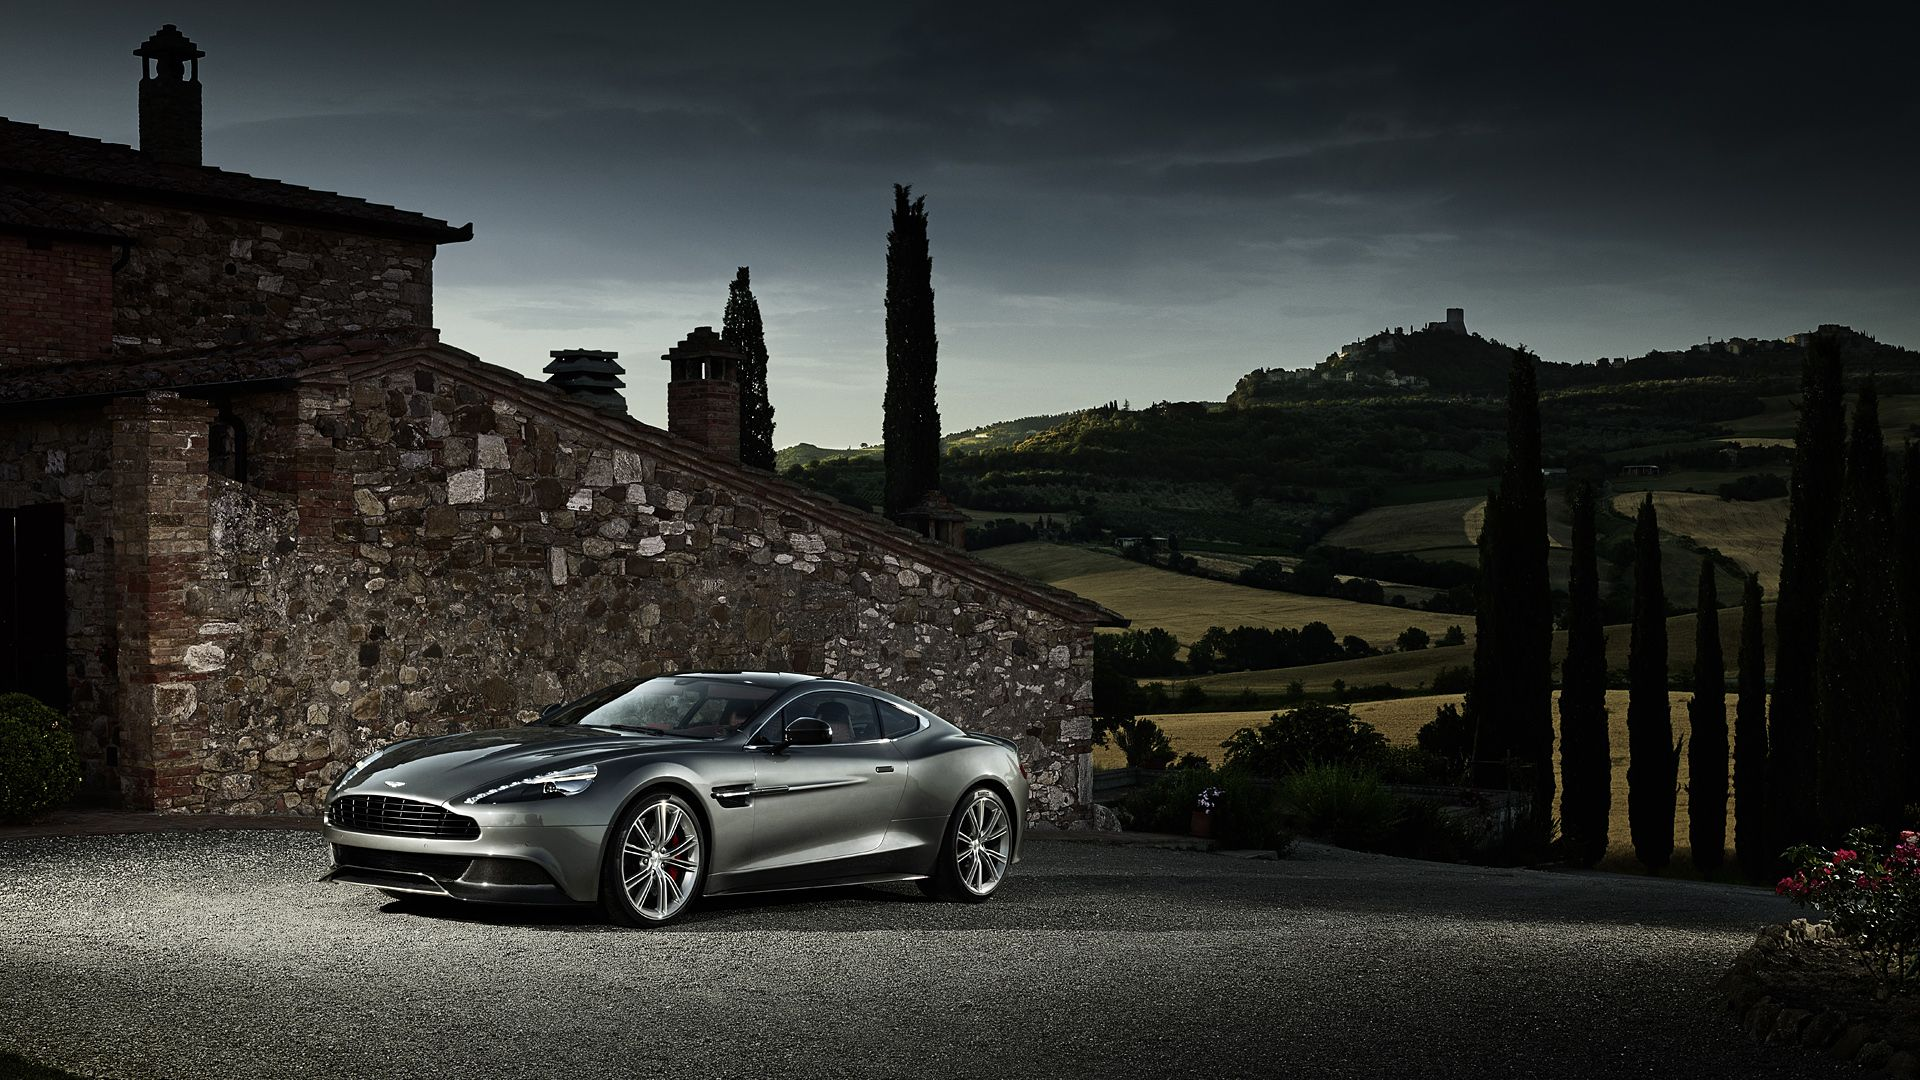 Aston Martin Wallpapers Top Free Aston Martin Backgrounds Wallpaperaccess